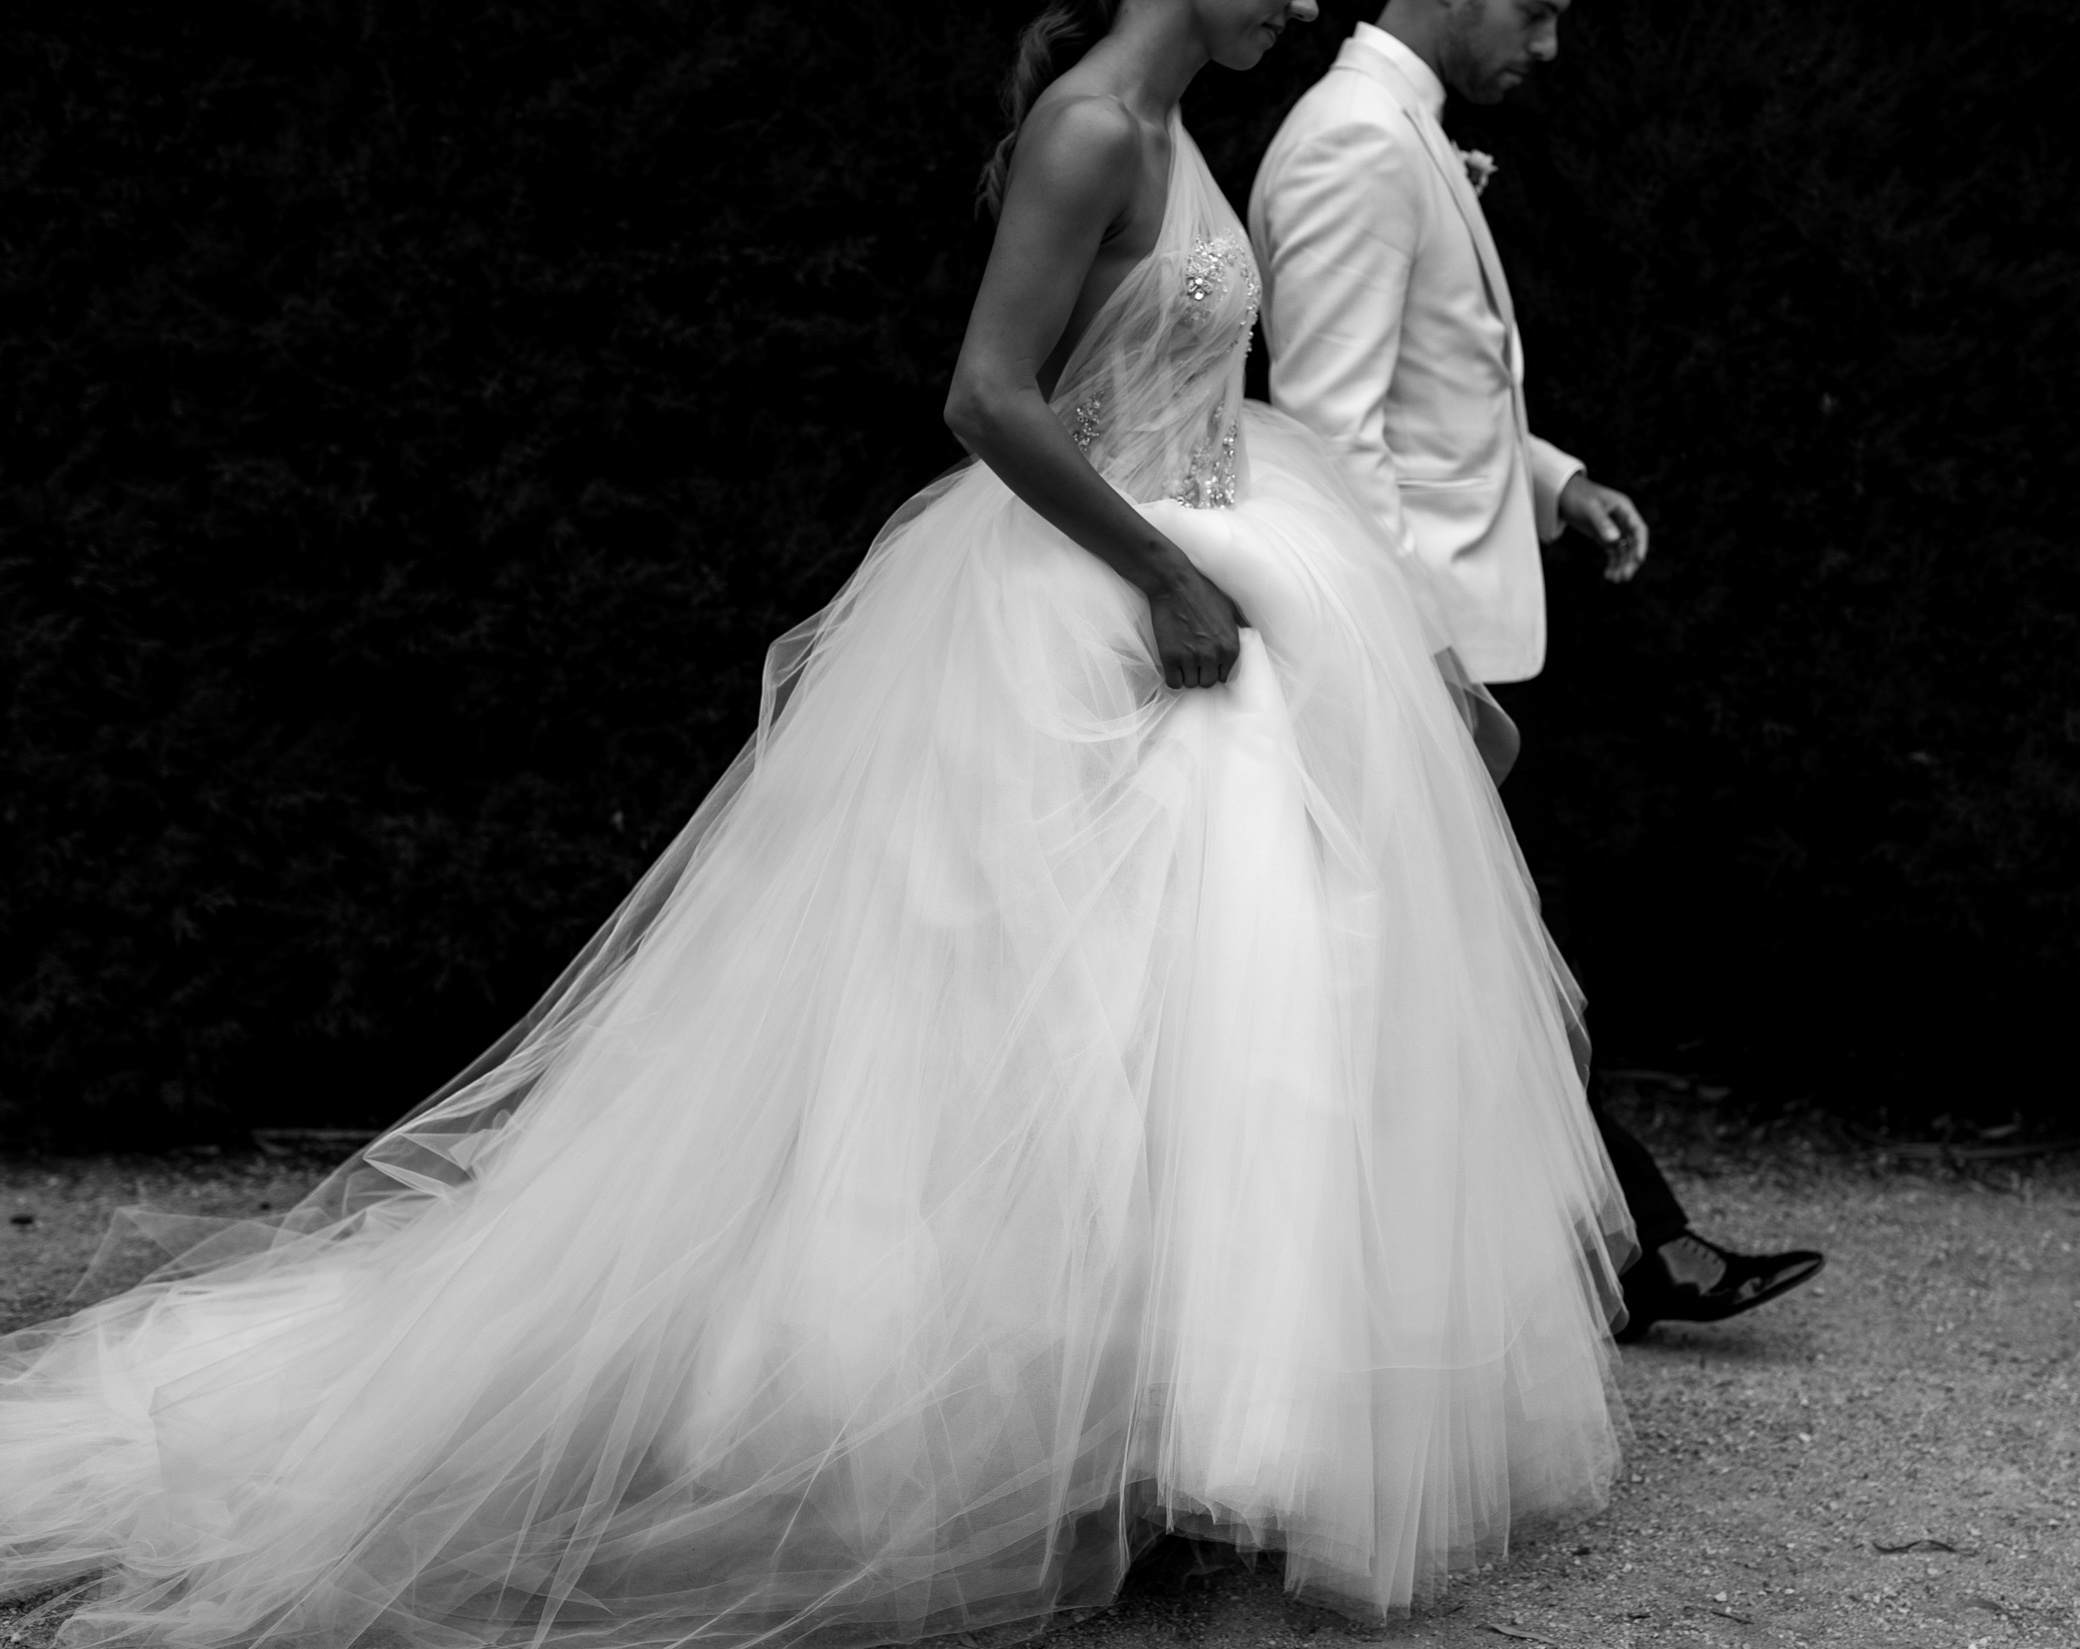 mr-theodore_white-vine-photography_same-sex-wedding-directory13.jpg